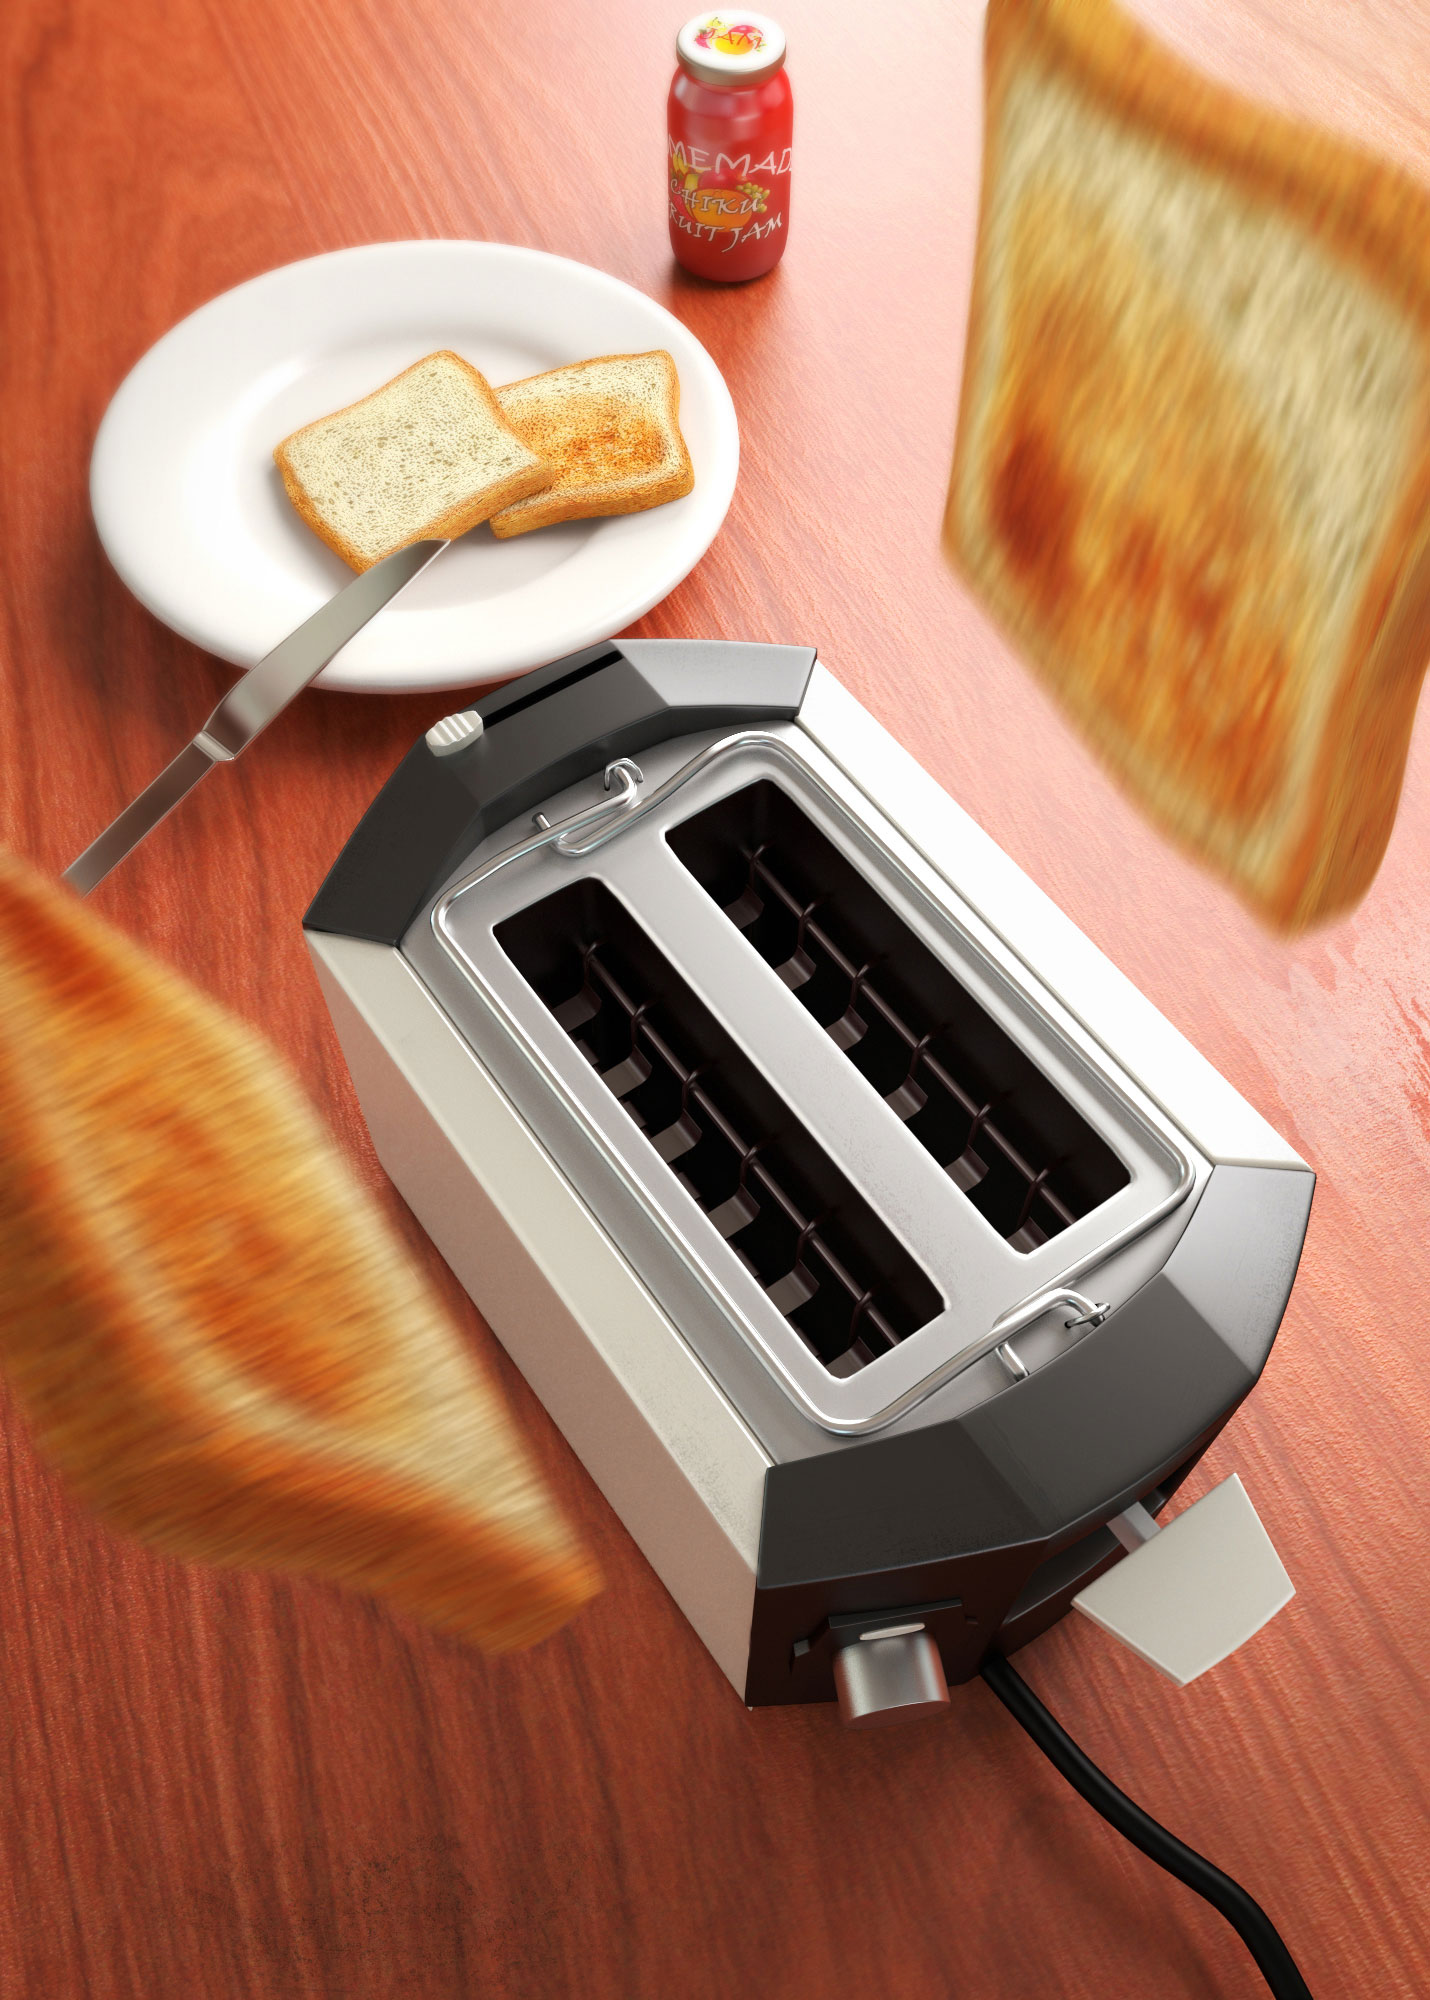 Toaster_High.jpg